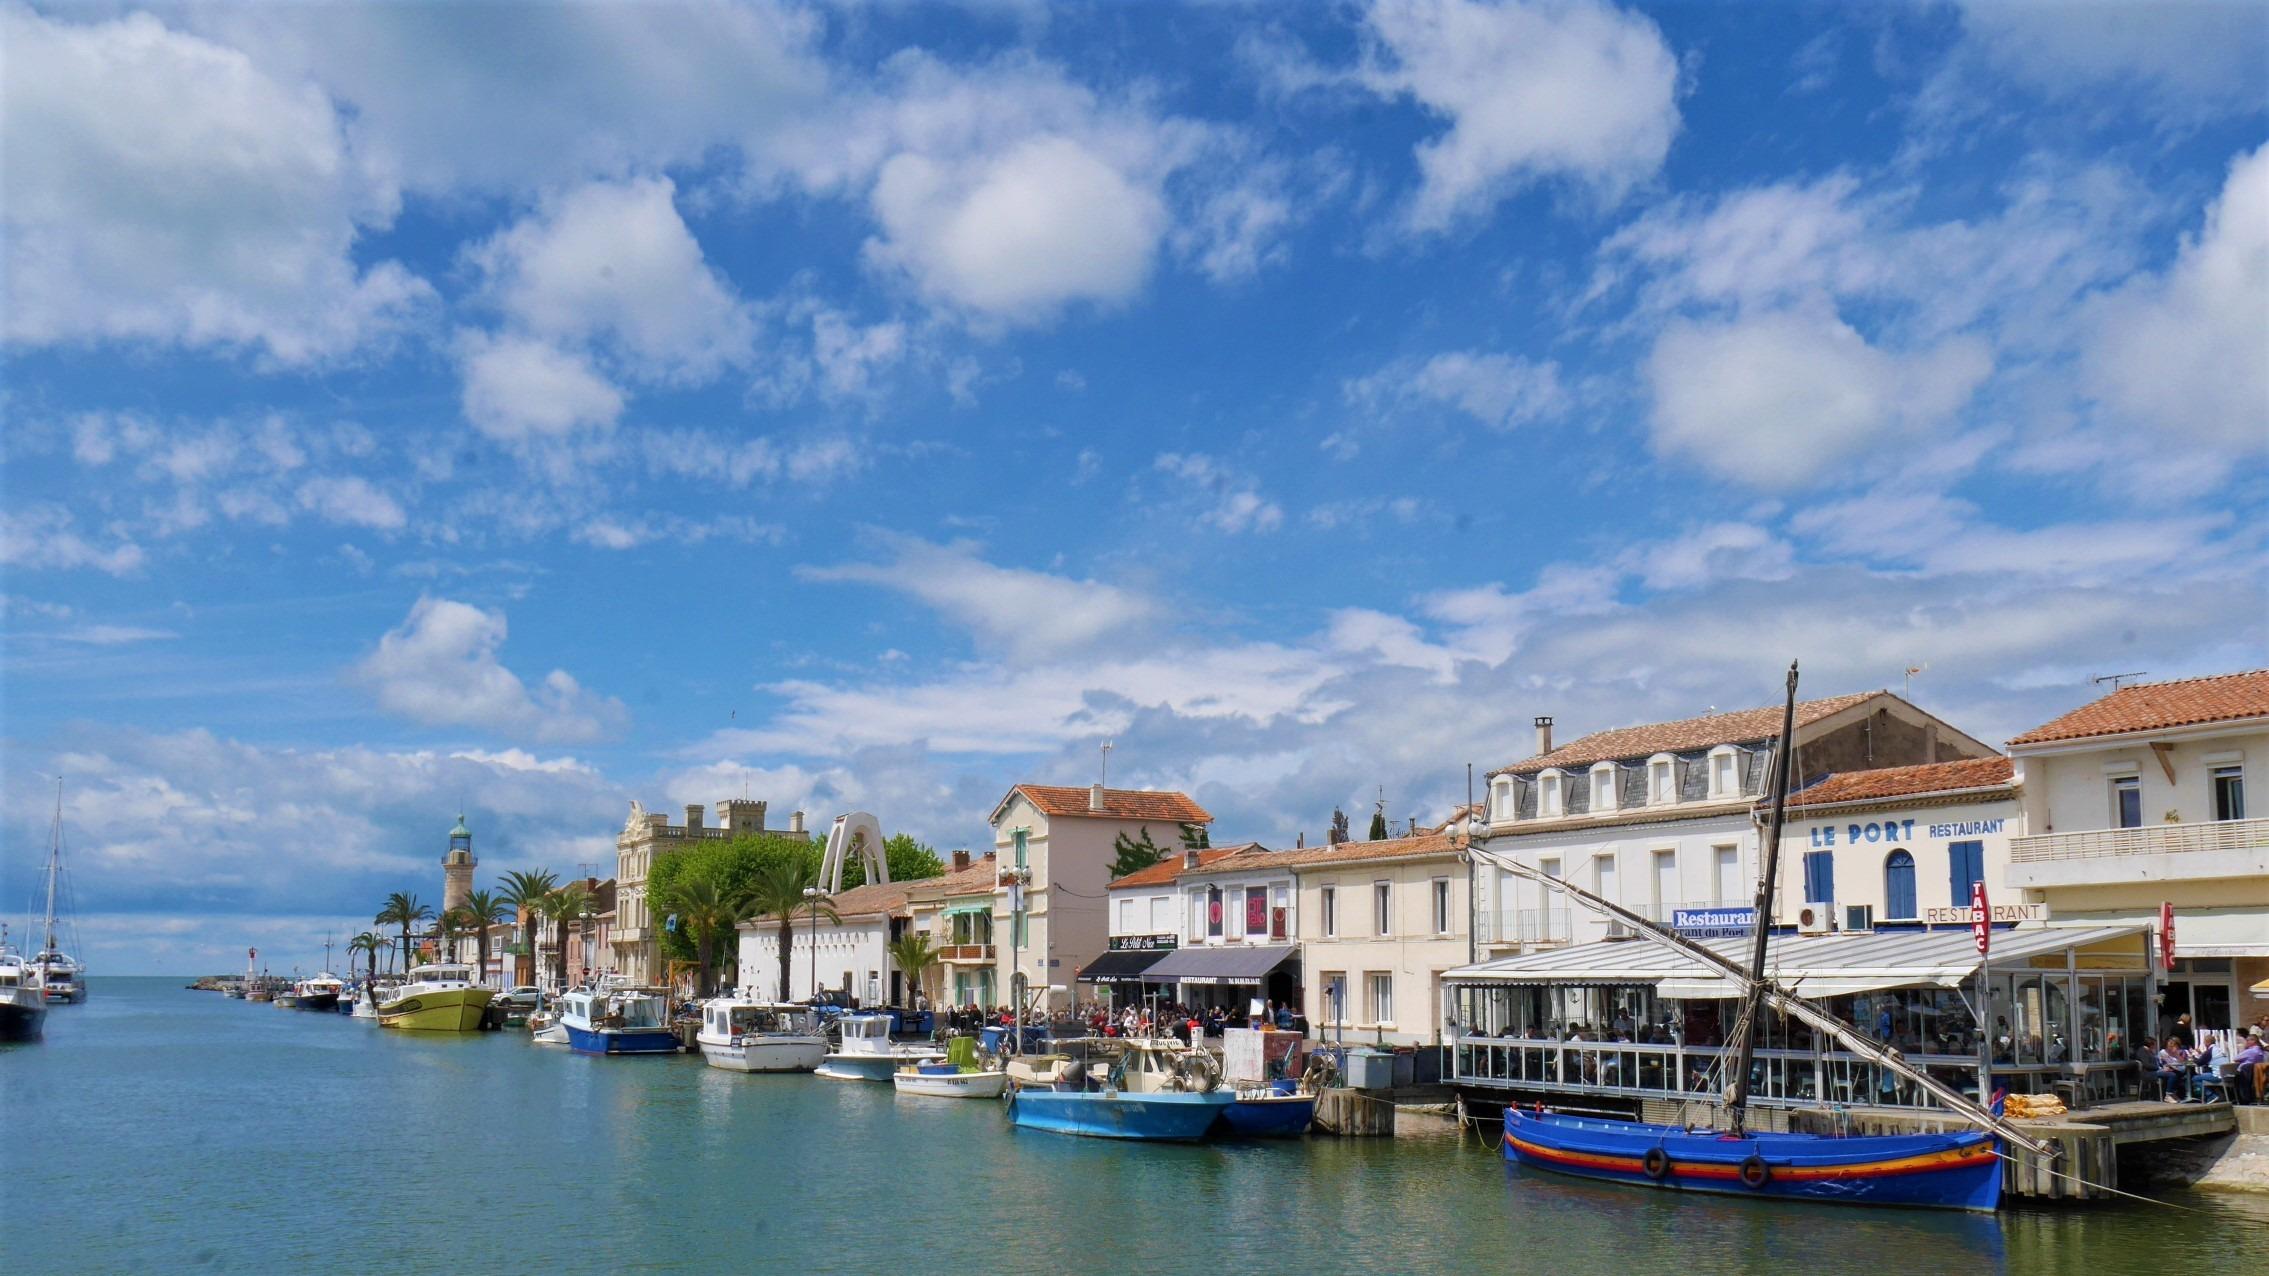 Camargue visiter Grau-du-roi blog voyage arpenter le chemin